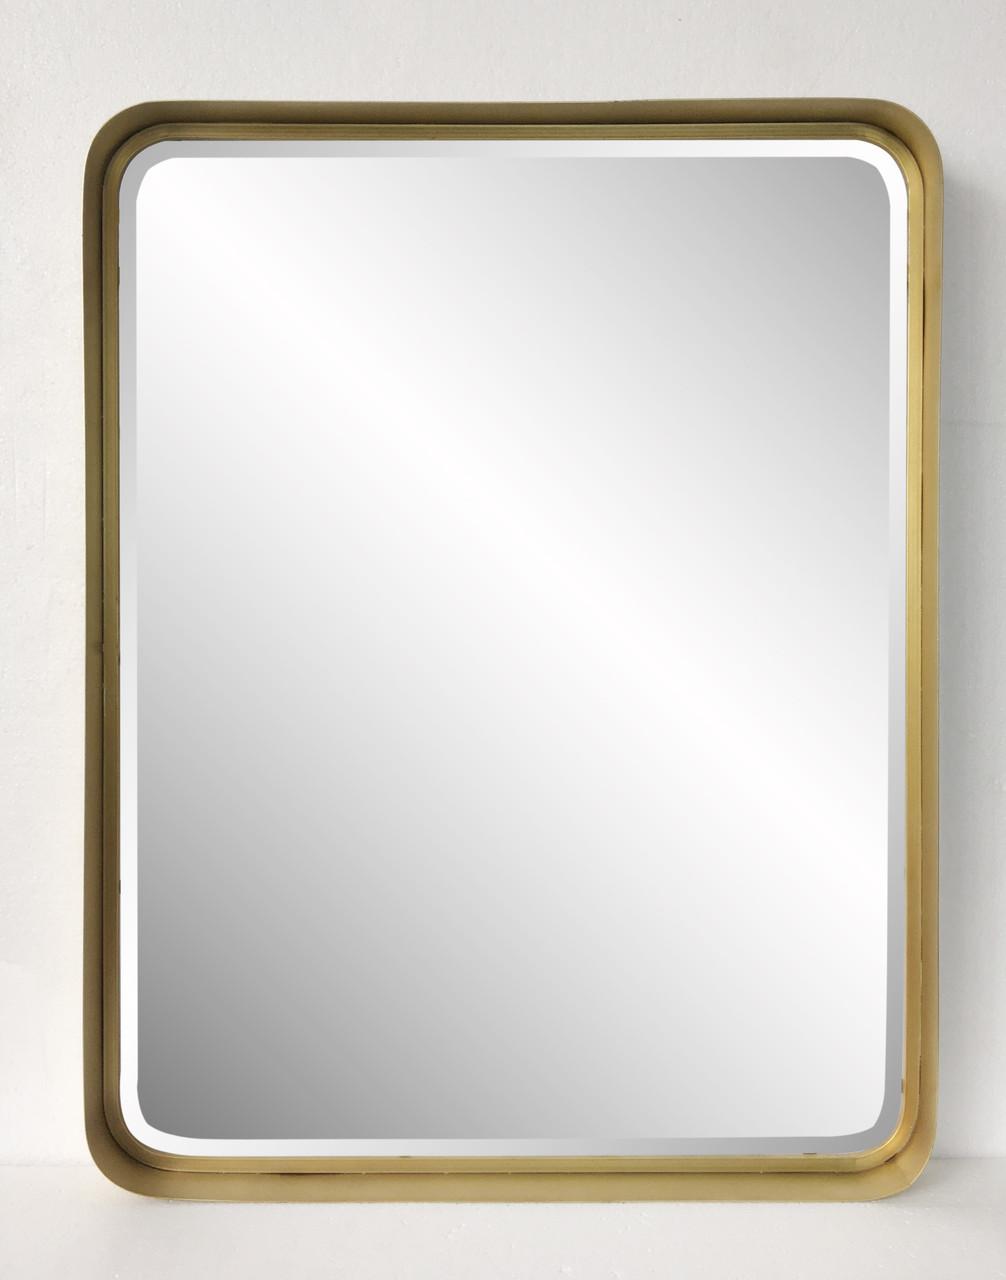 Tray Gold Iron Metal Vanity Mirror Sbc Decor